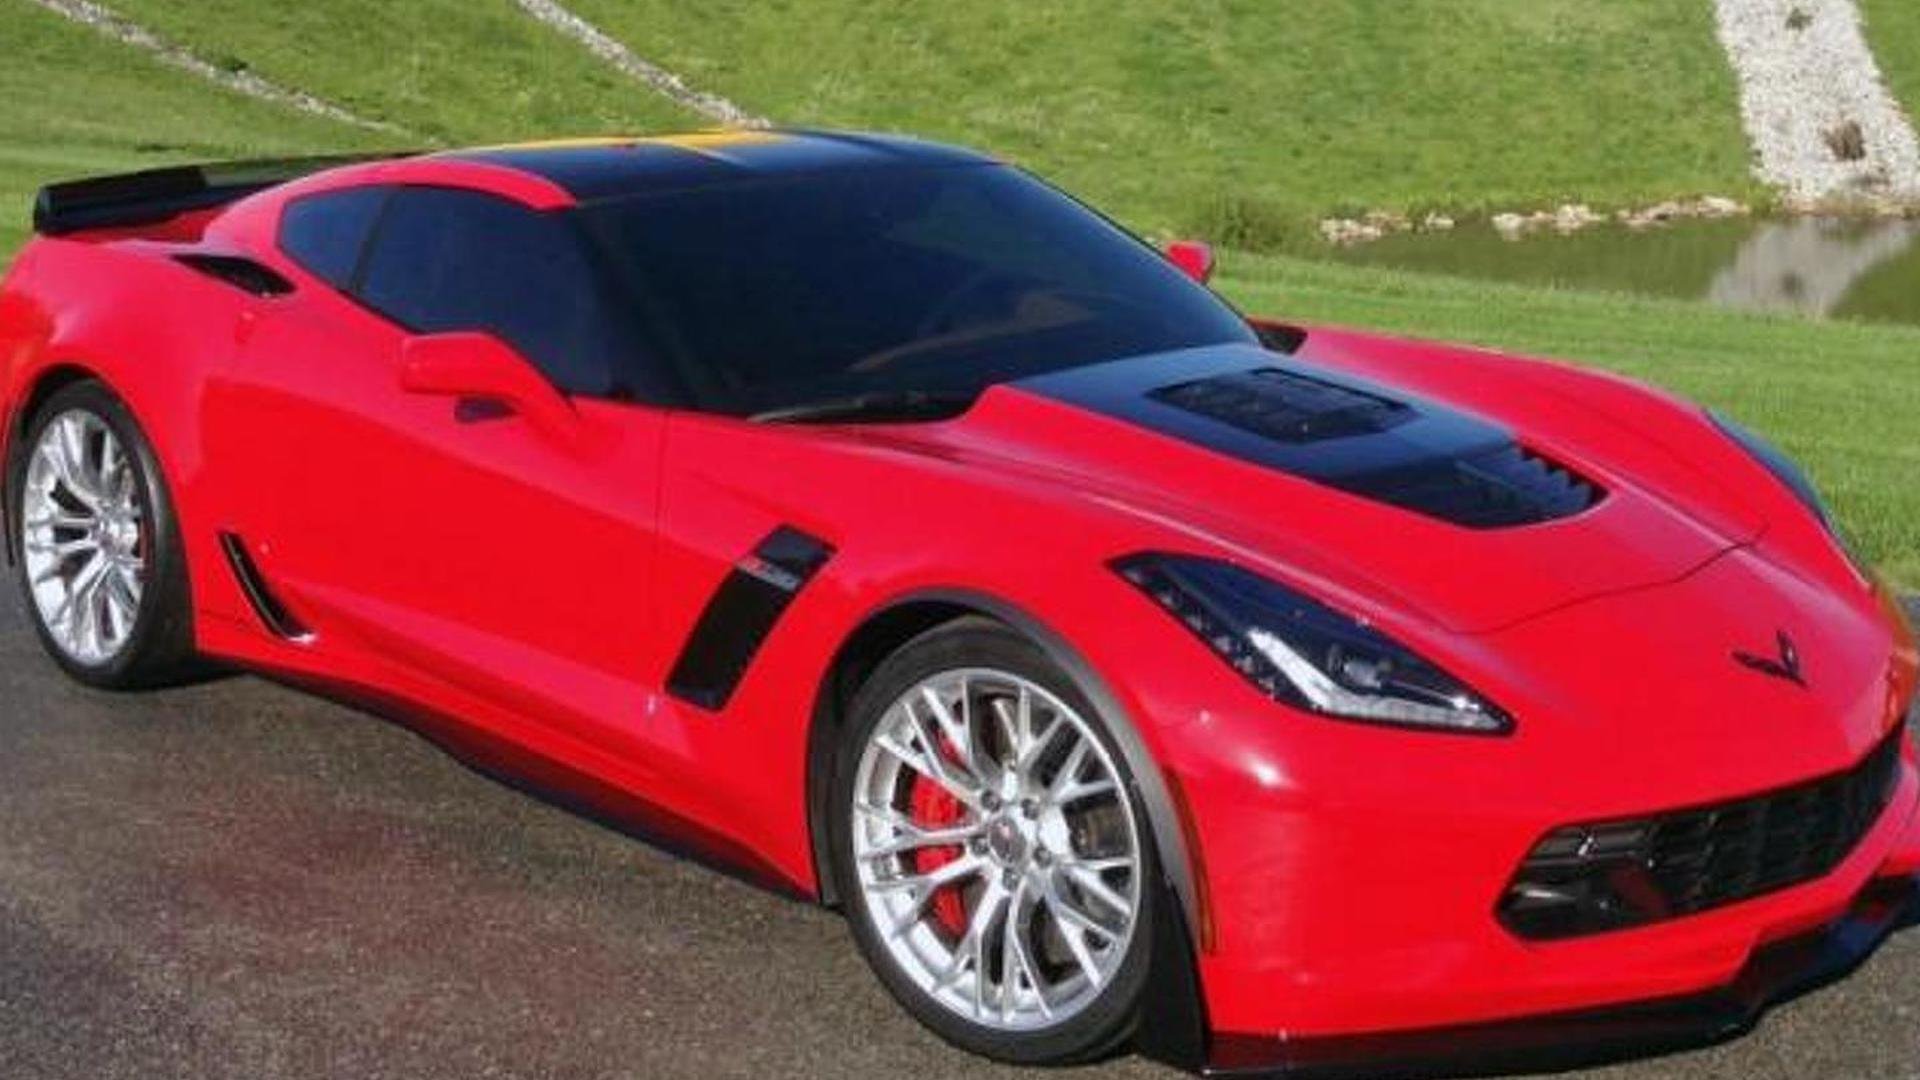 Callaway tunes the Corvette Z06 to 757 bhp